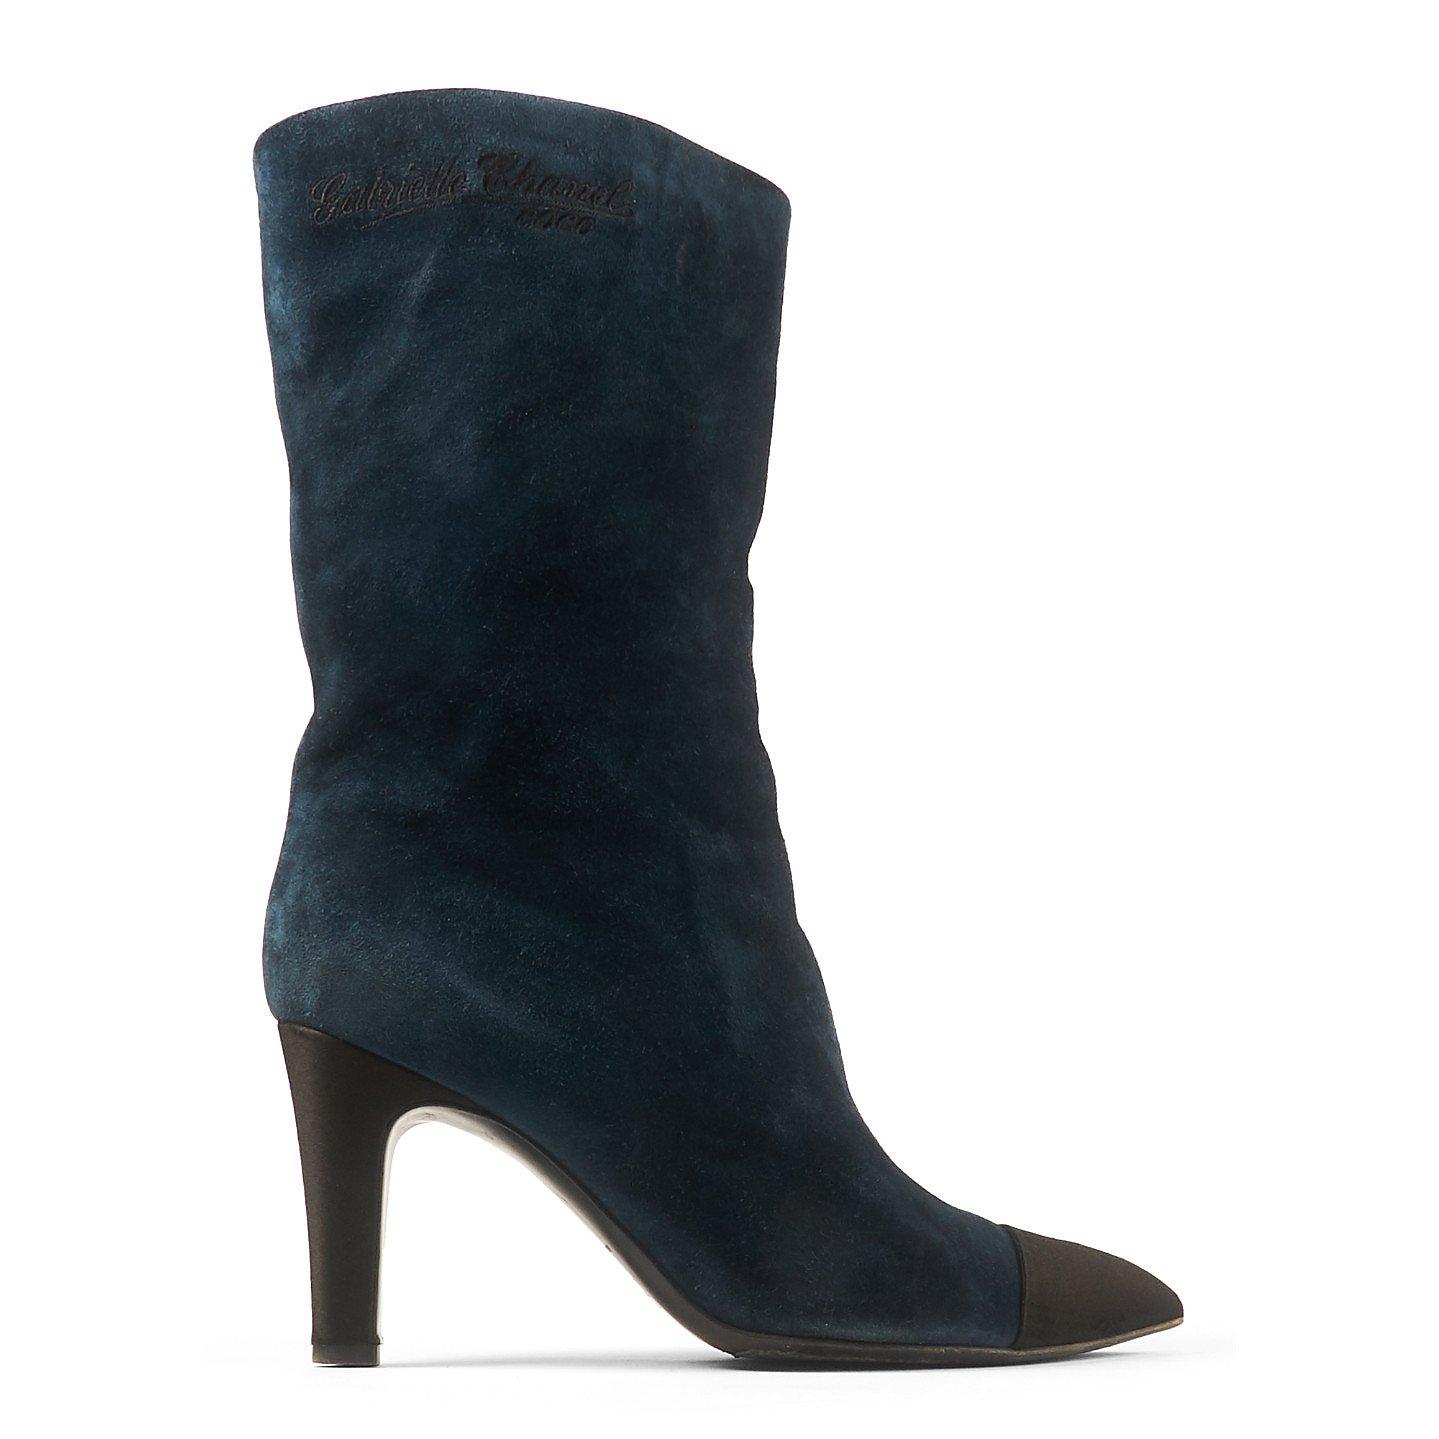 CHANEL Suede High Heel Boots